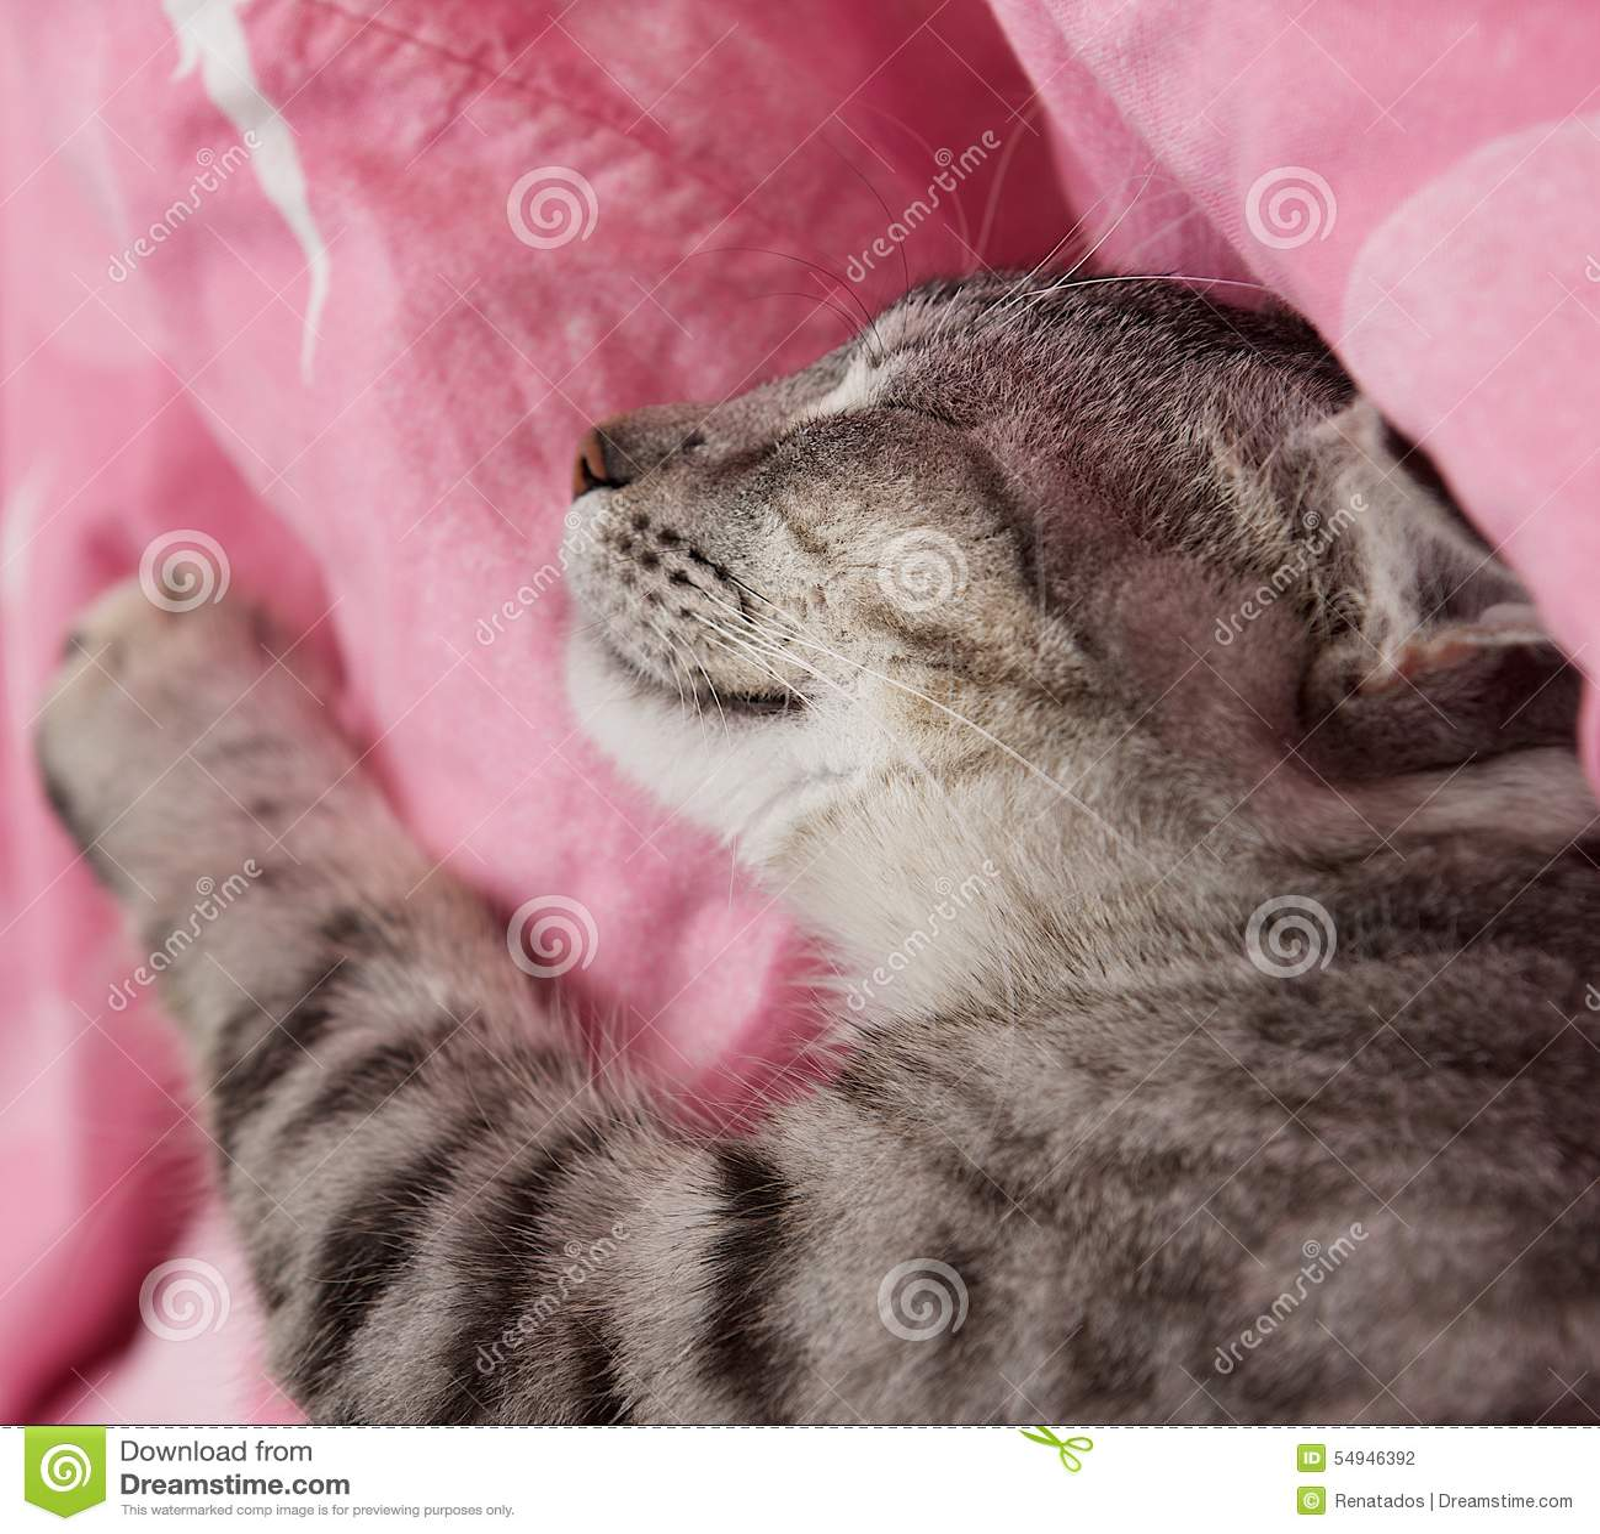 cat potty training